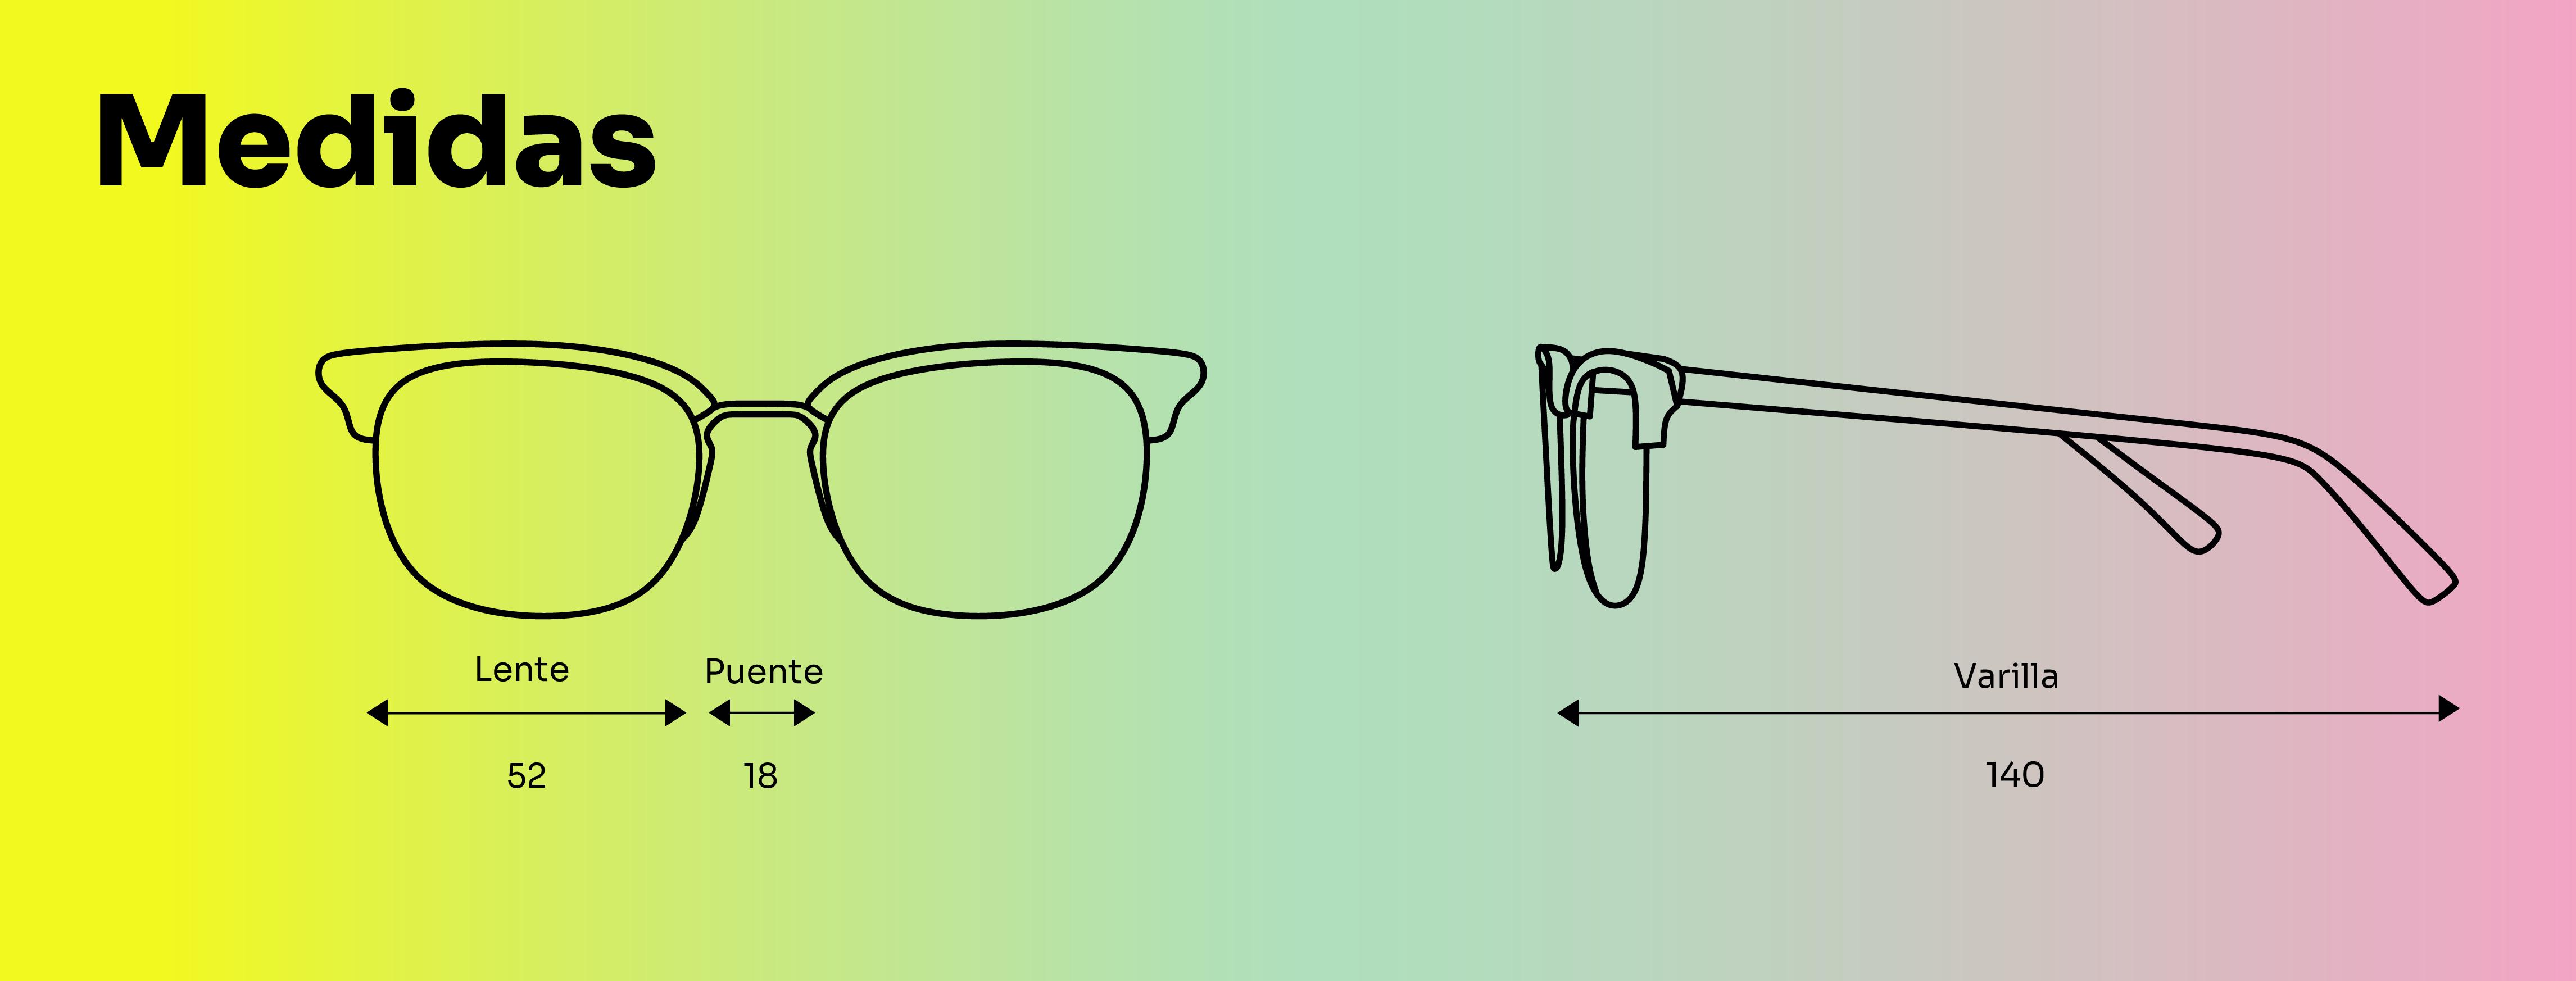 medidas-montura-de-gafas-graduadas-de-marca-Lett